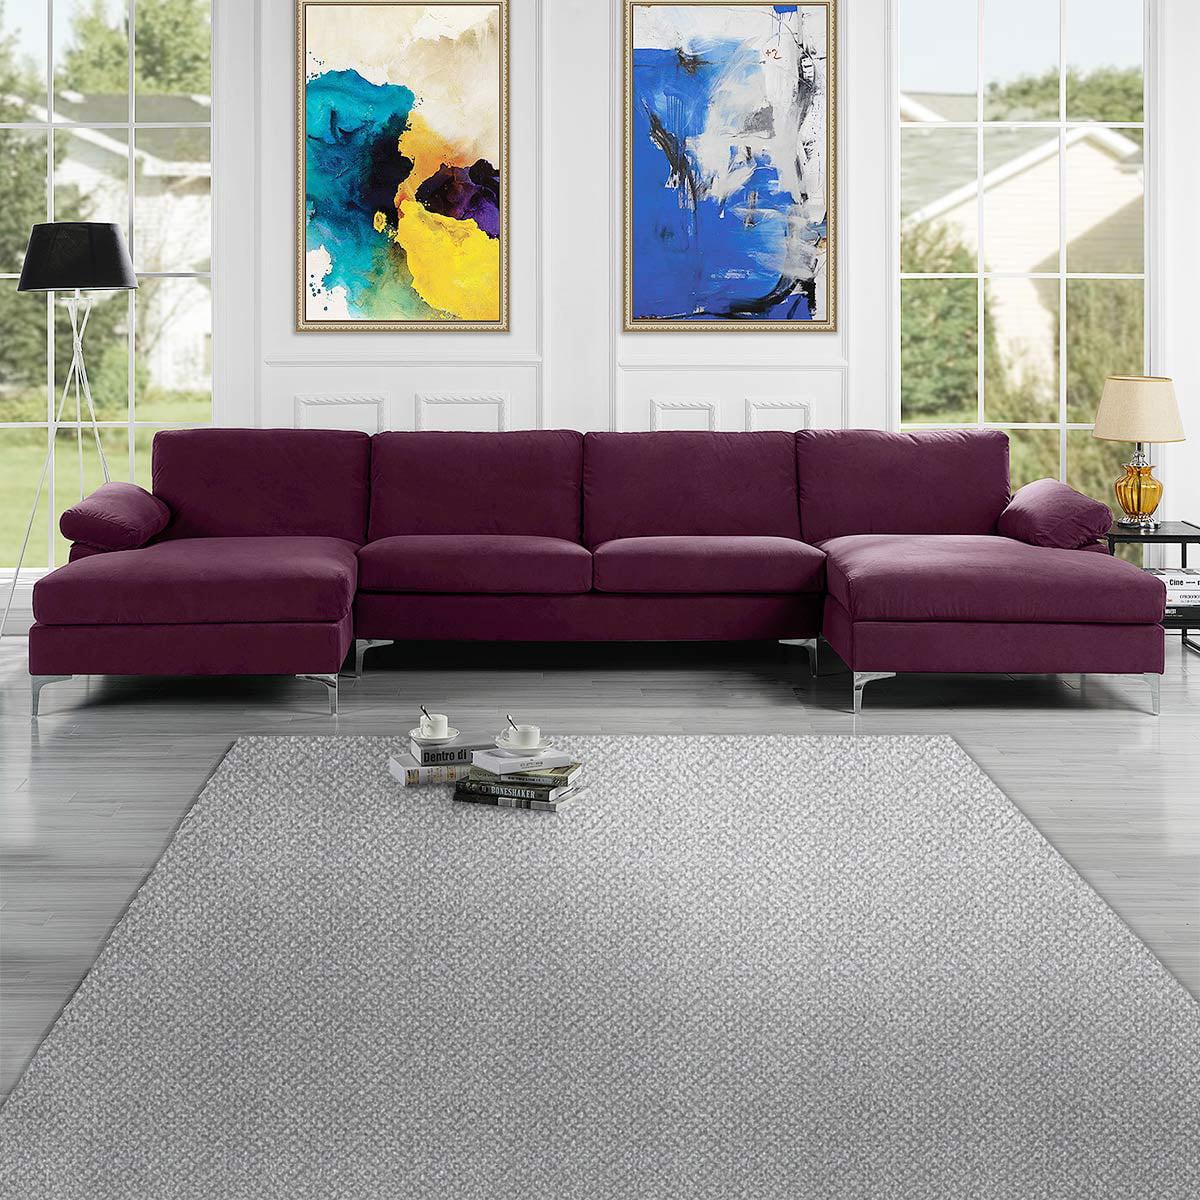 mobilis modern large microfiber velvet fabric u shape sectional sofa with double extra wide chaise lounge purple walmart com